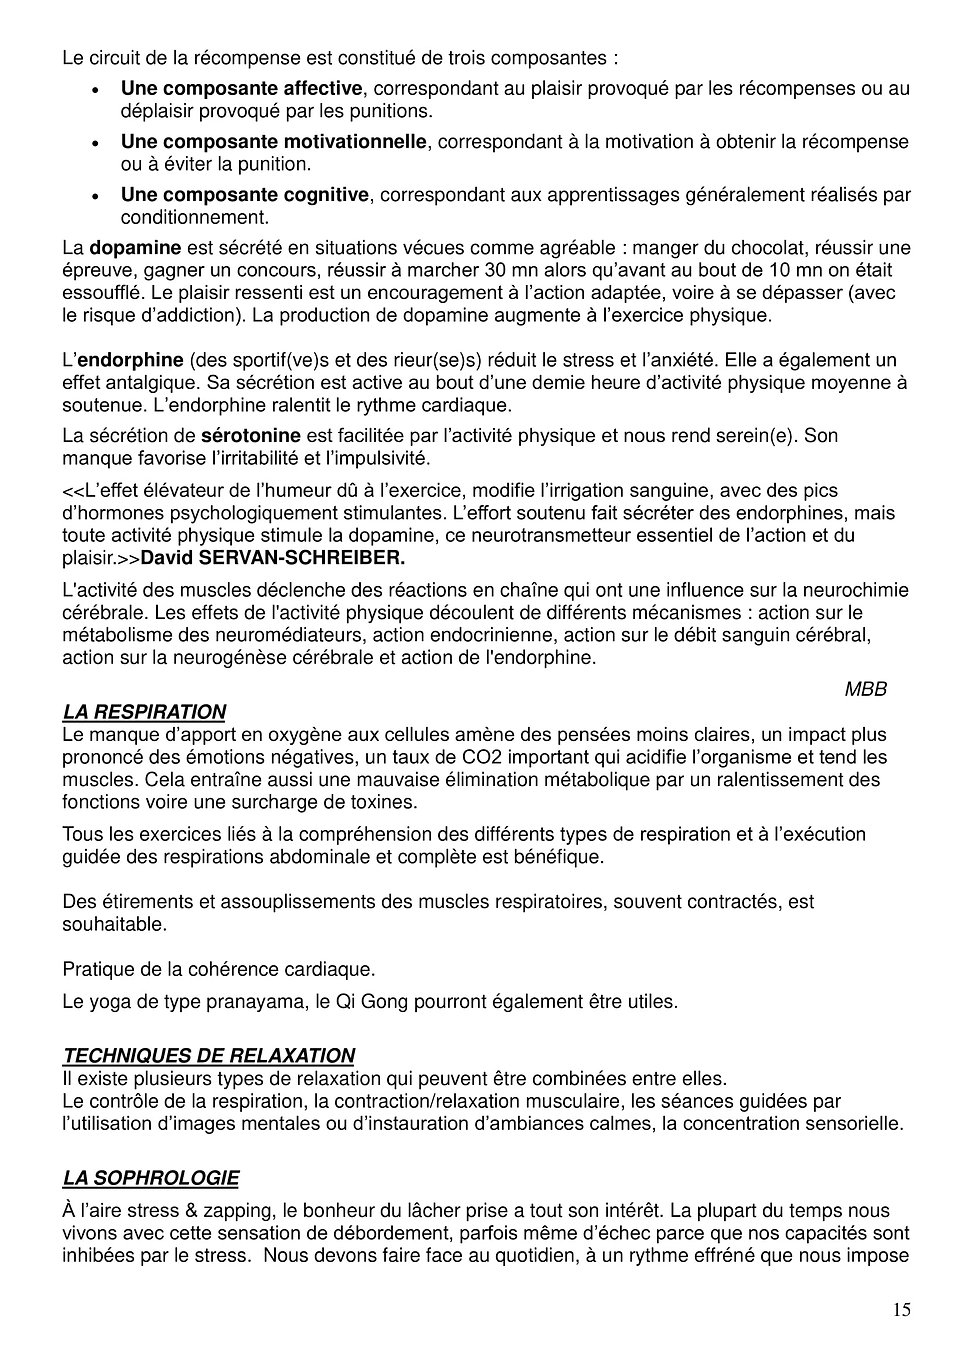 STRESS_et_ÉMOTIONS-15.jpg